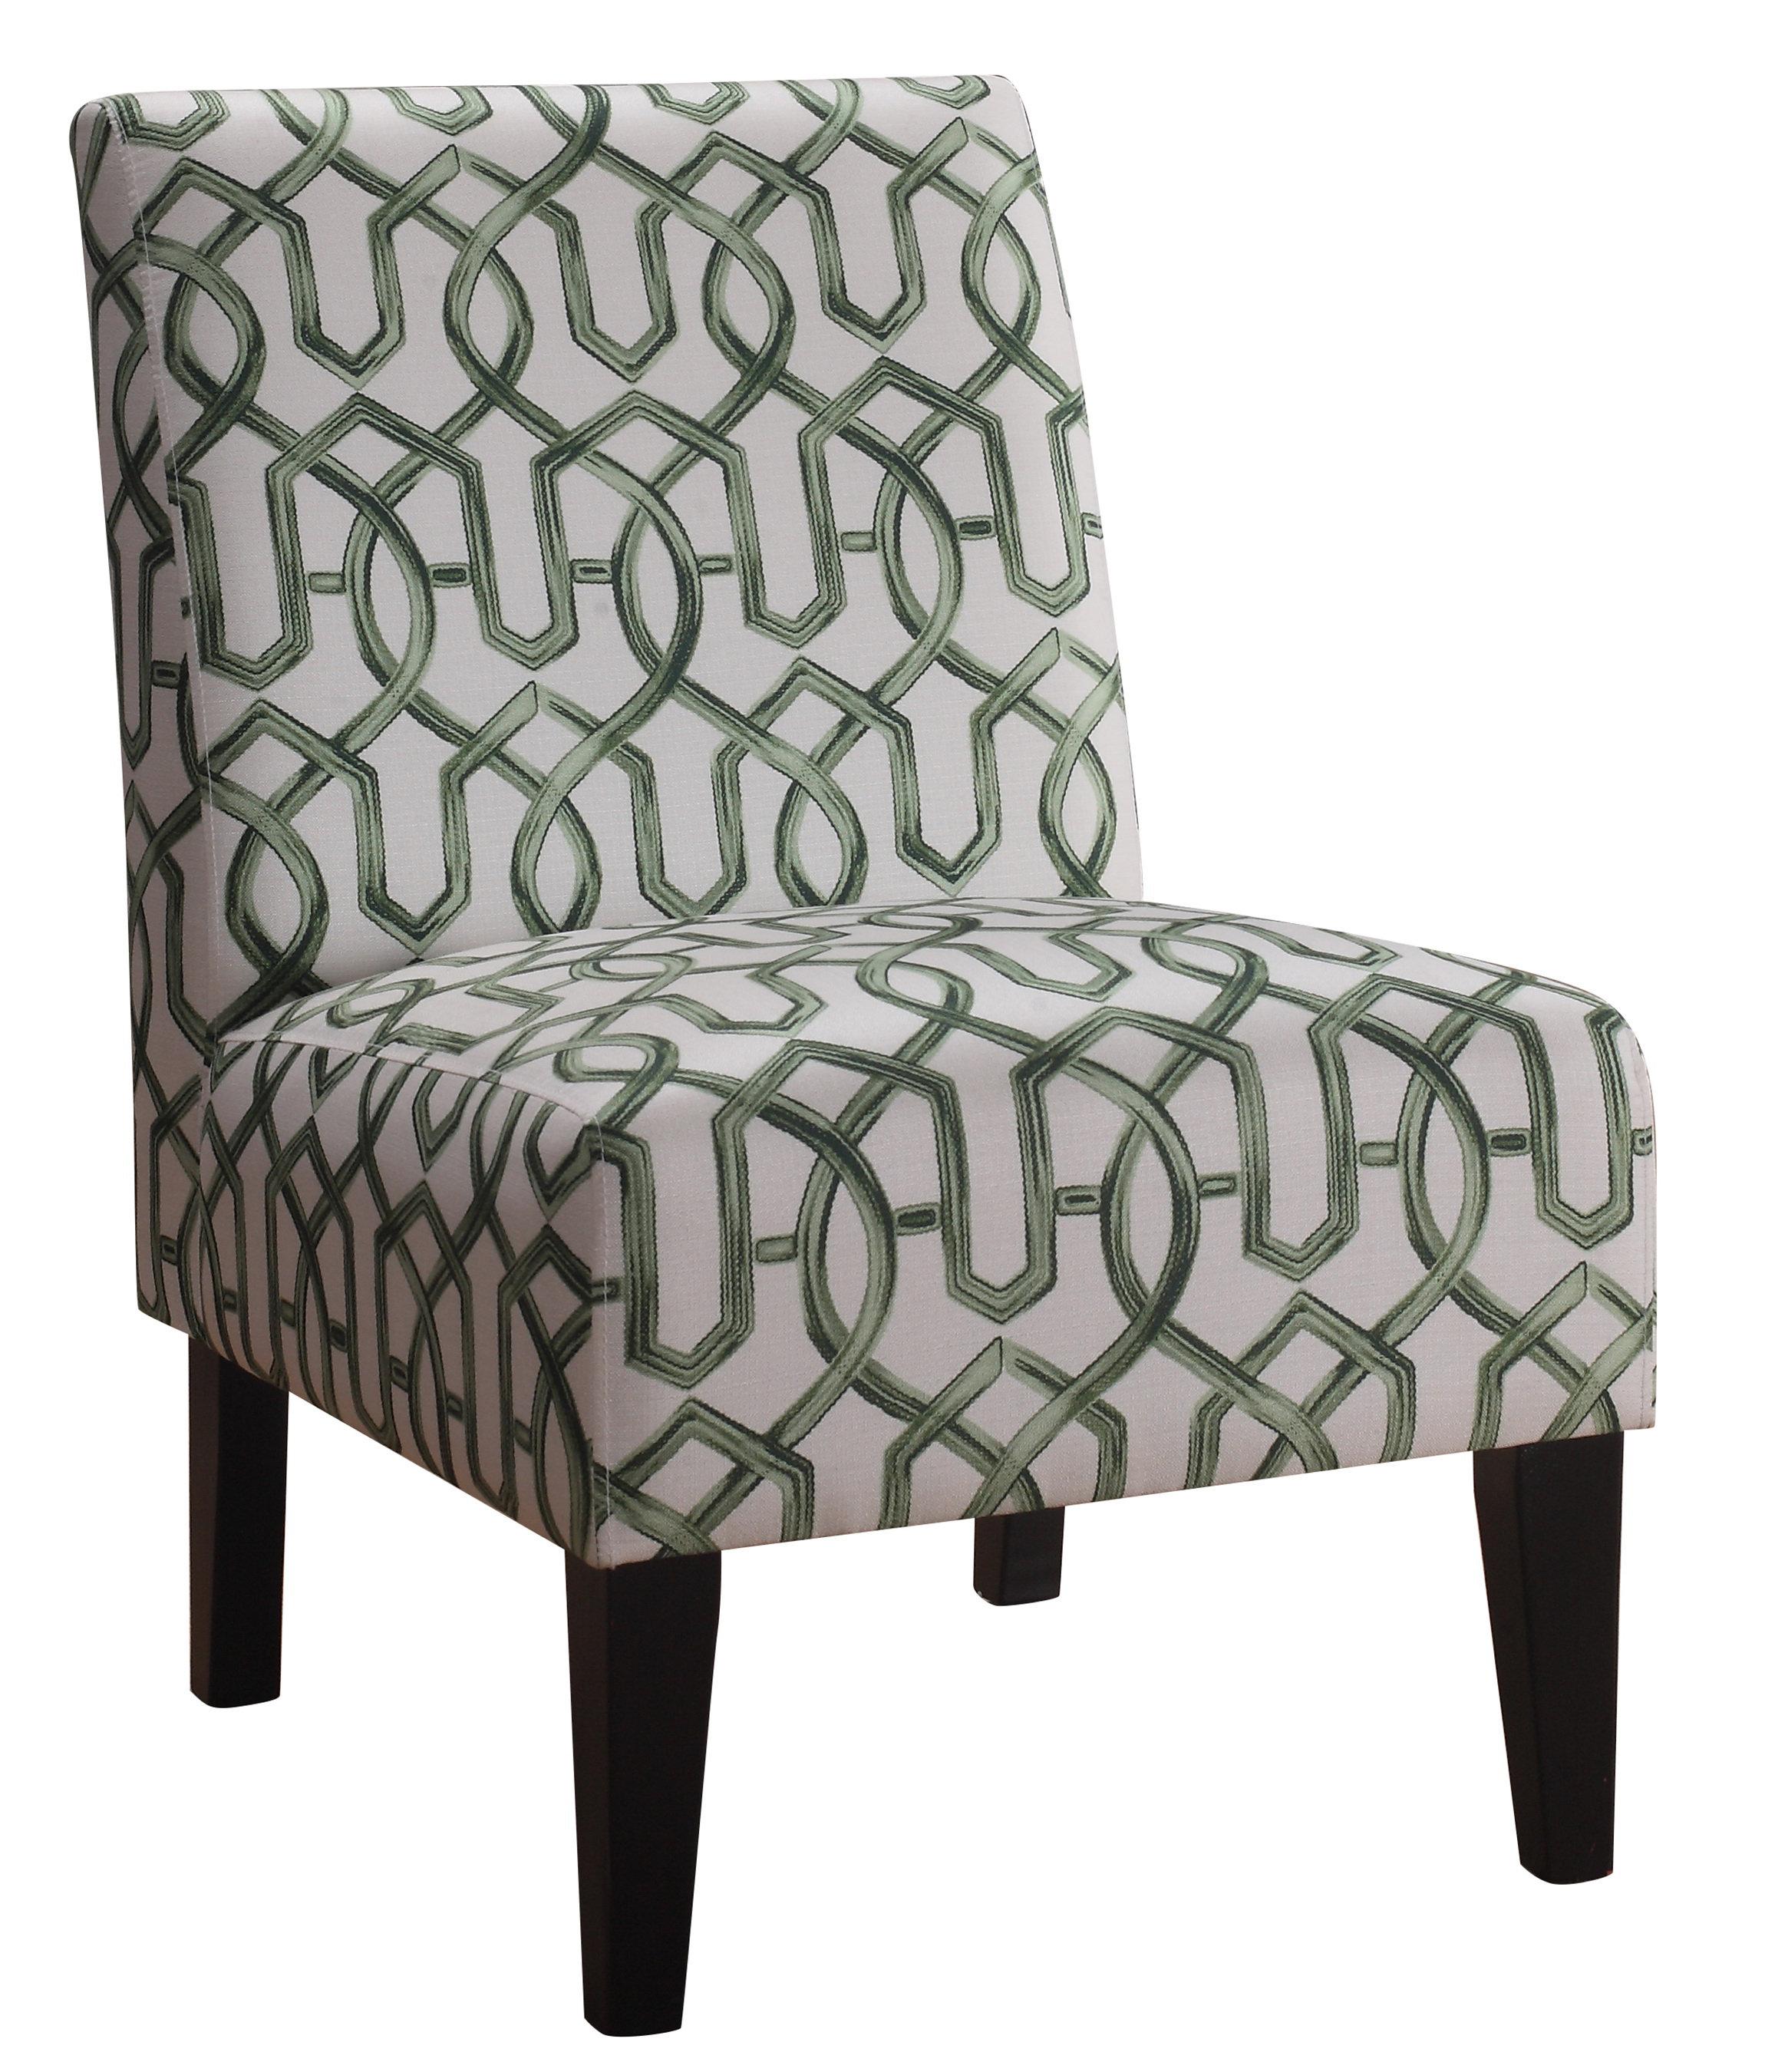 INSTANT HOME Karina Slipper Chair U0026 Reviews   Wayfair